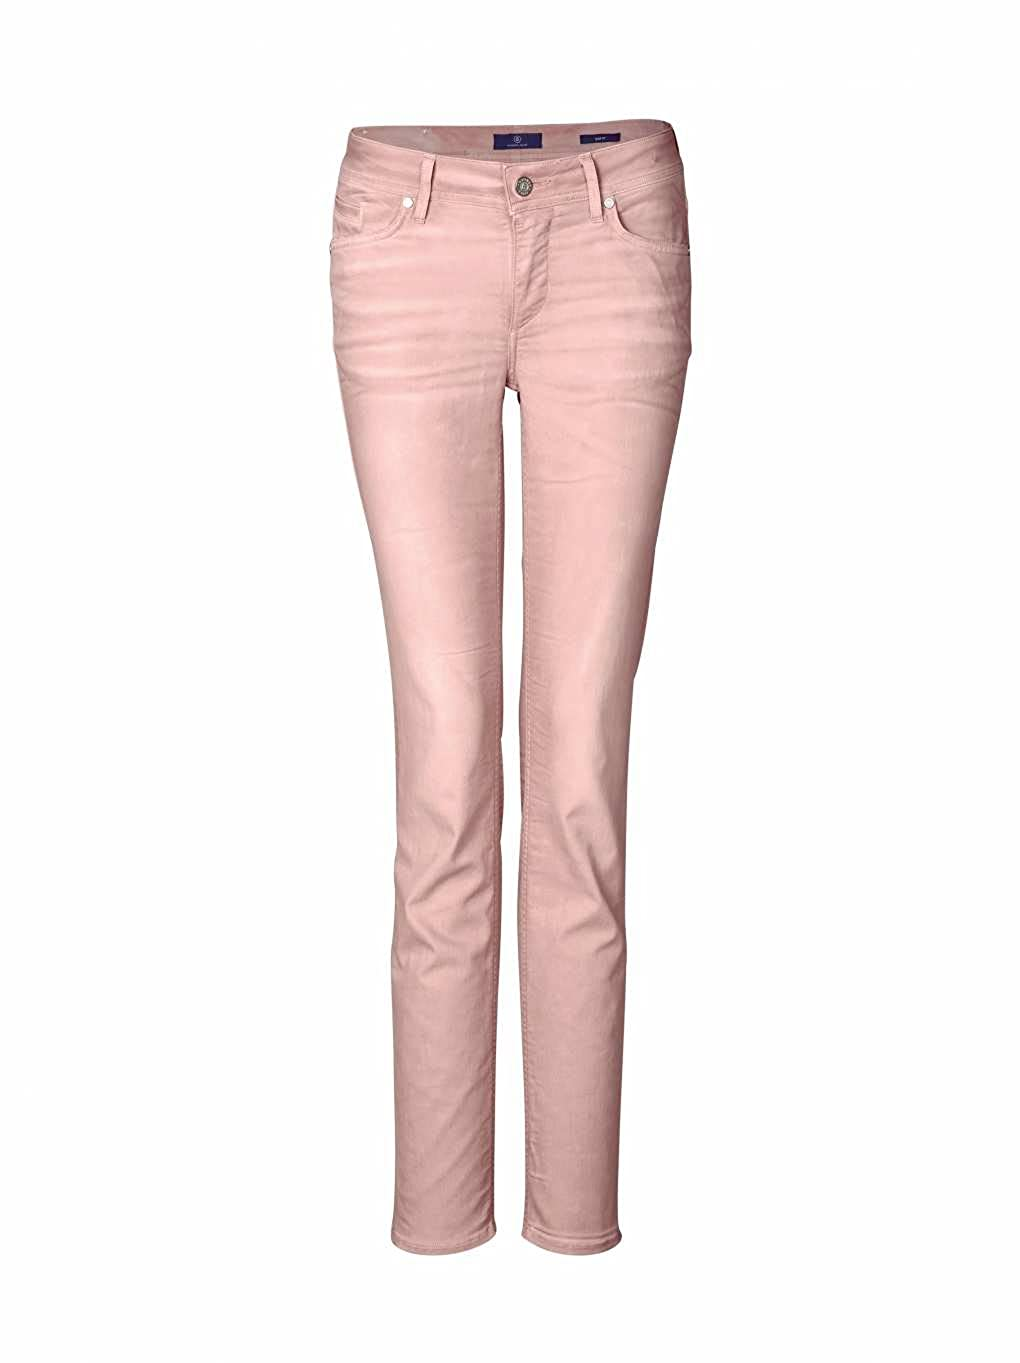 super specials look good shoes sale good looking Bogner Jeans Damen Jeans SO Slim (ash Rosa 795) (29/34 ...